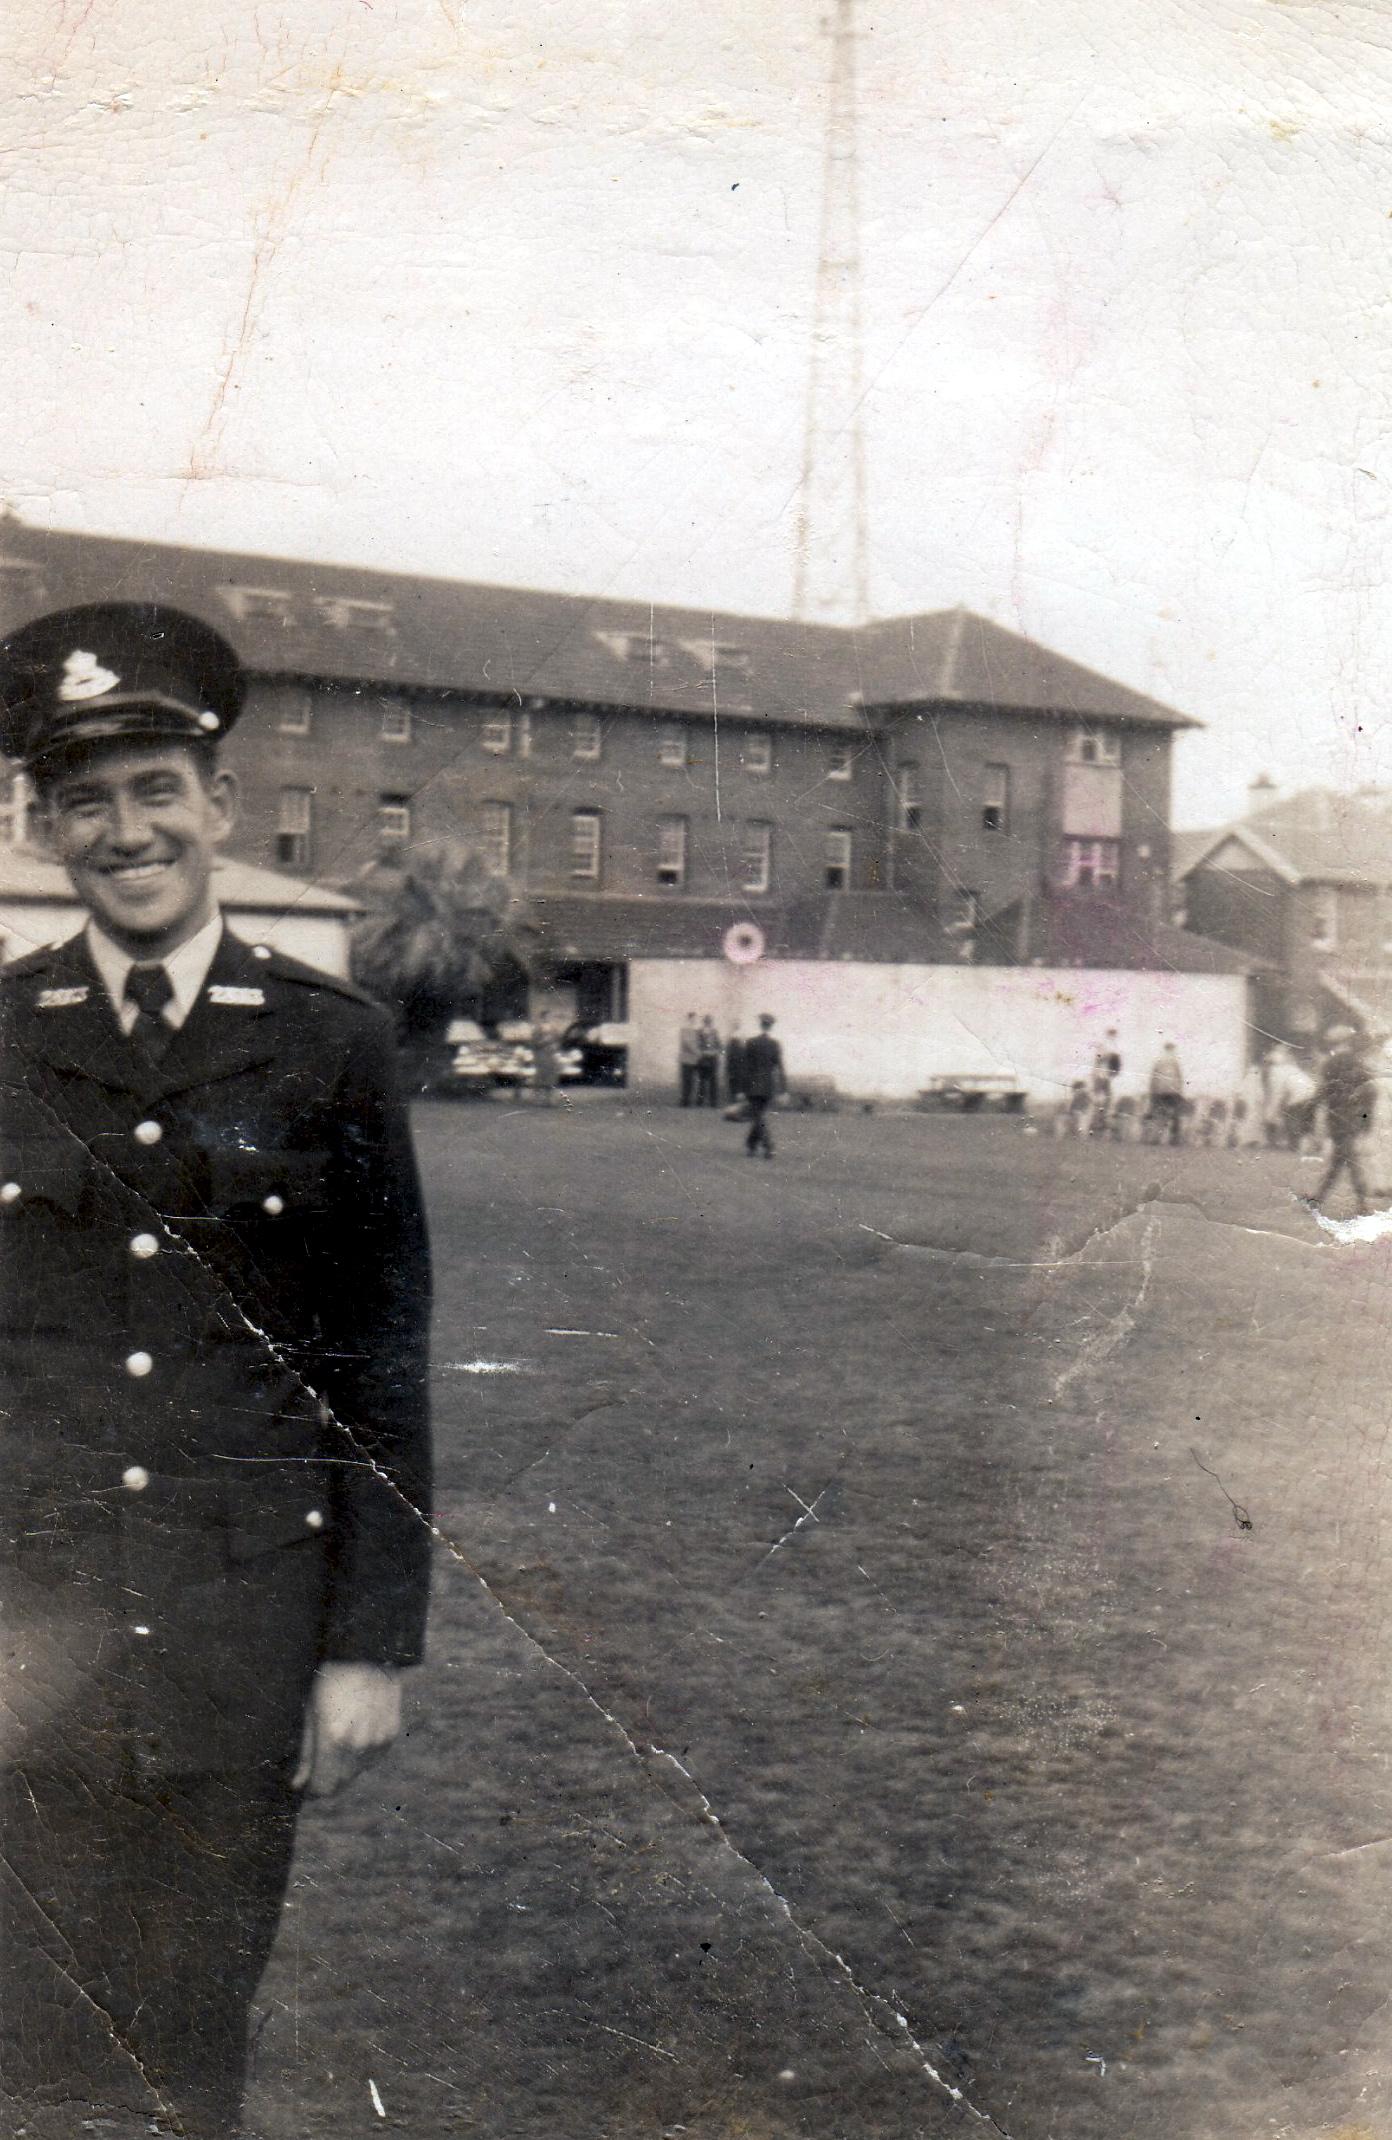 Maurice Raymond McDIARMID at Redfern Police Academy